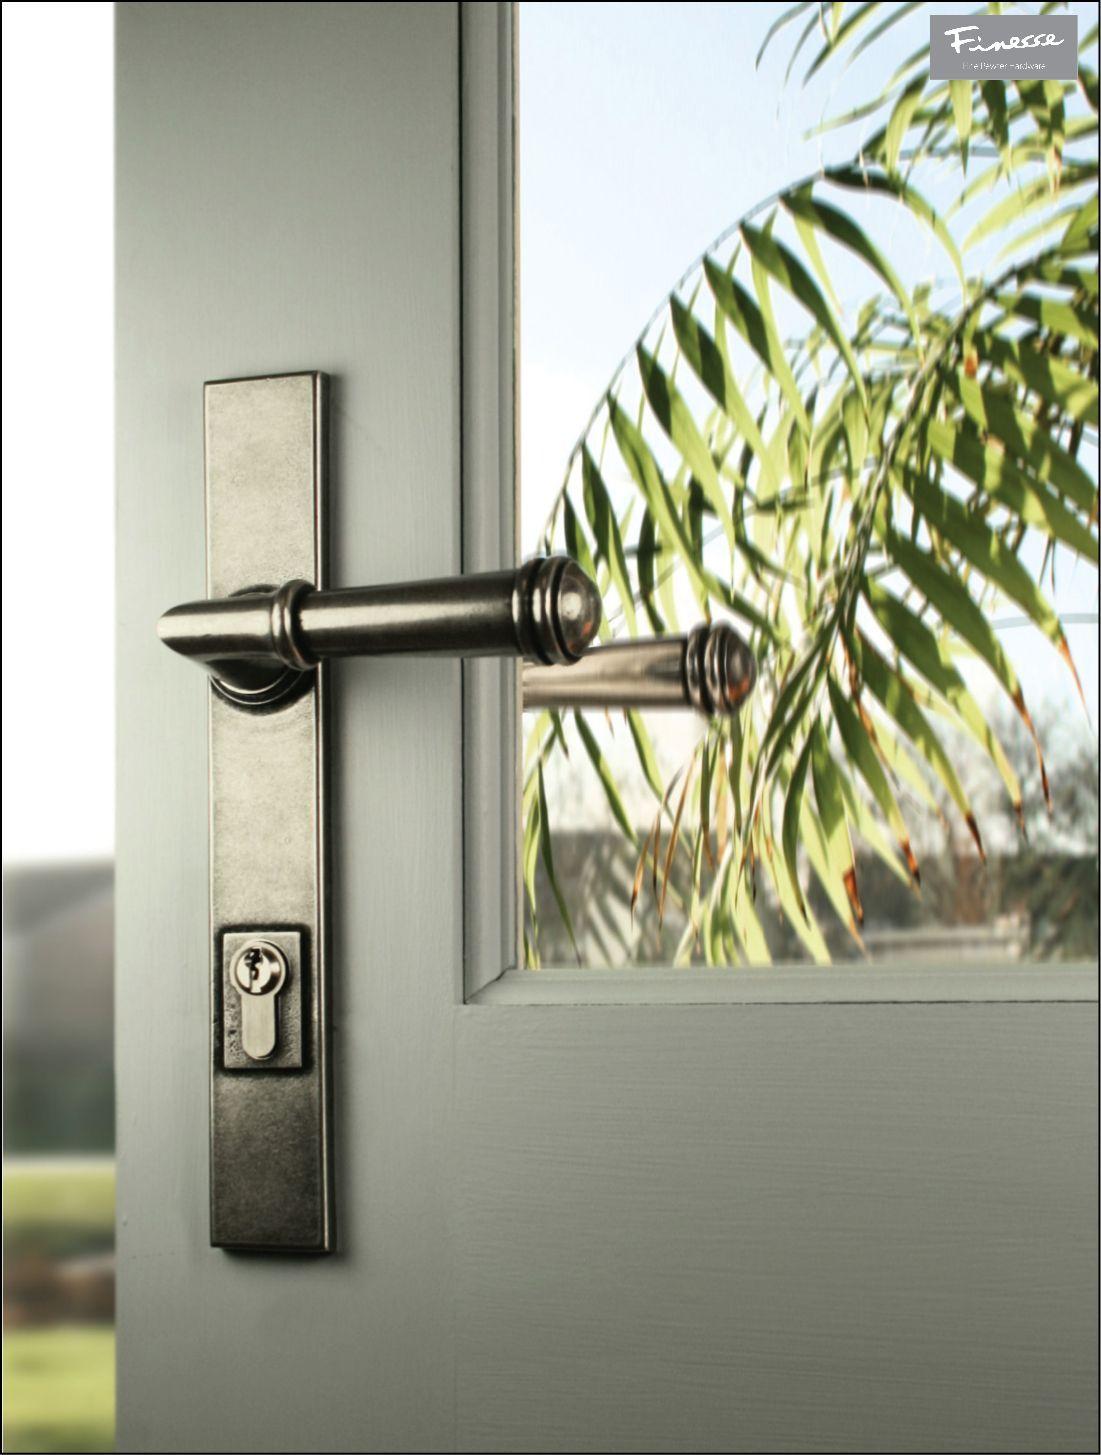 Durham FDMP01 Solid Pewter Multipoint Espag Locking Door